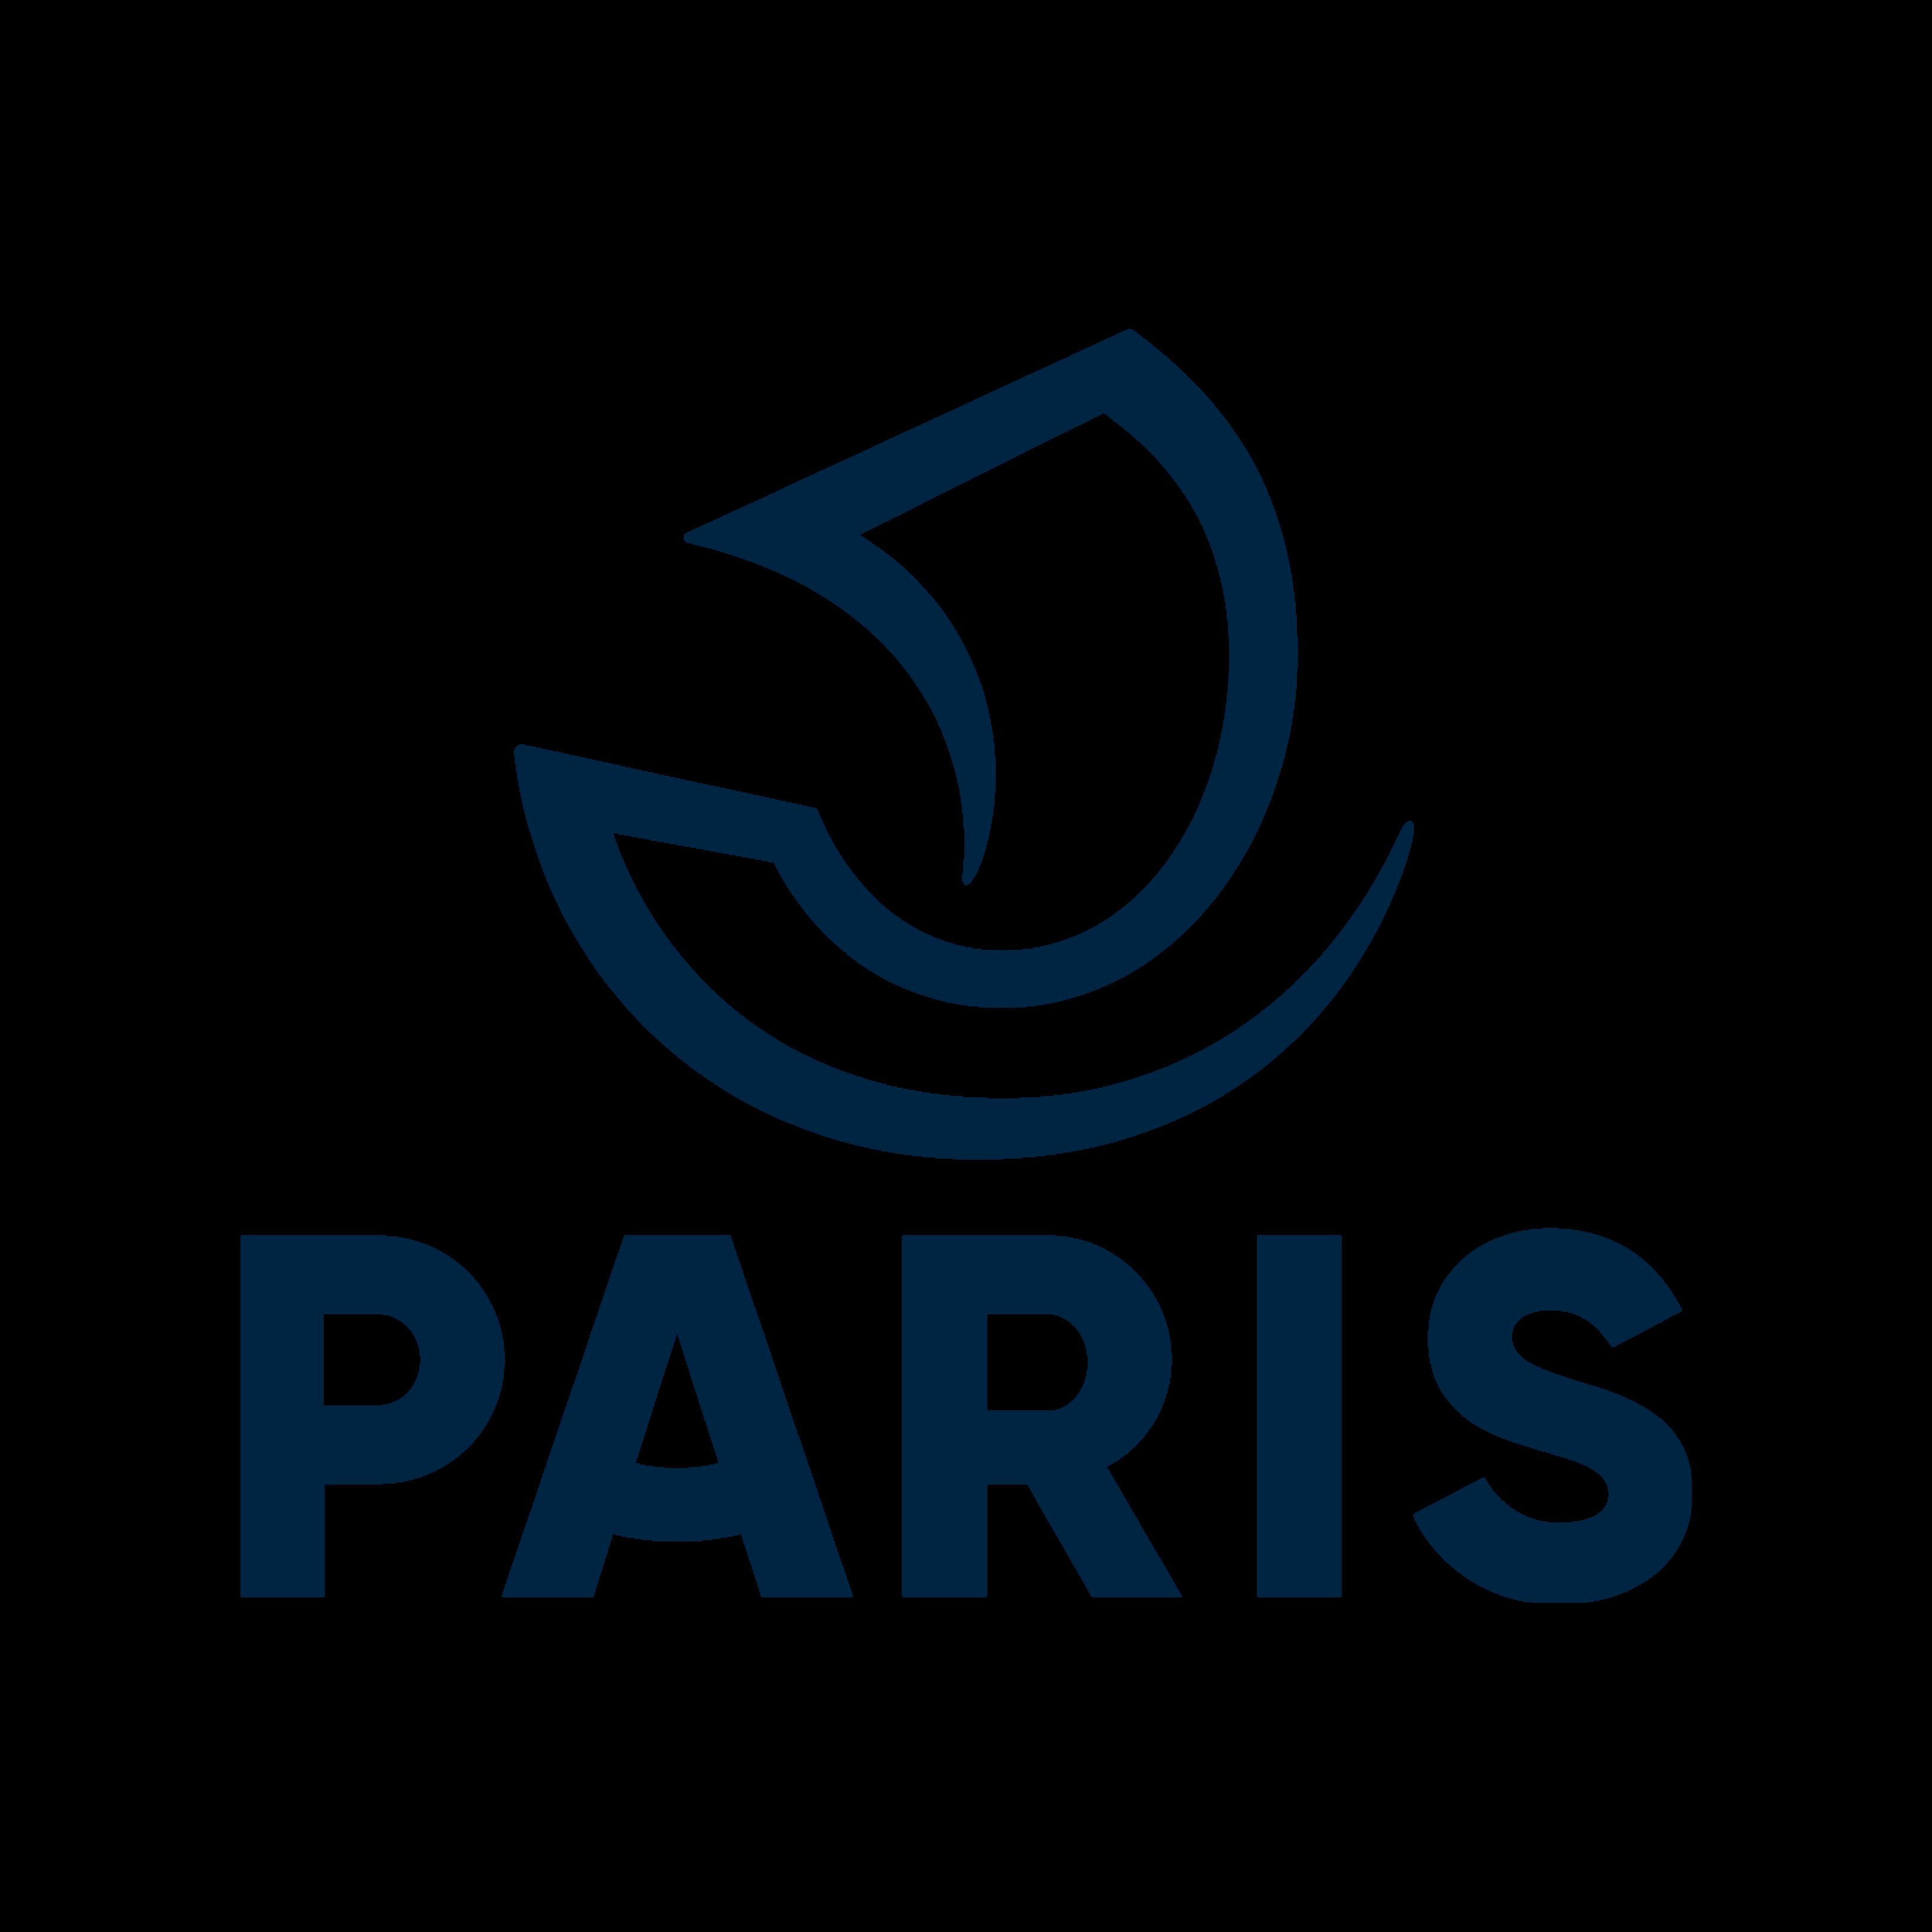 Paris logo png